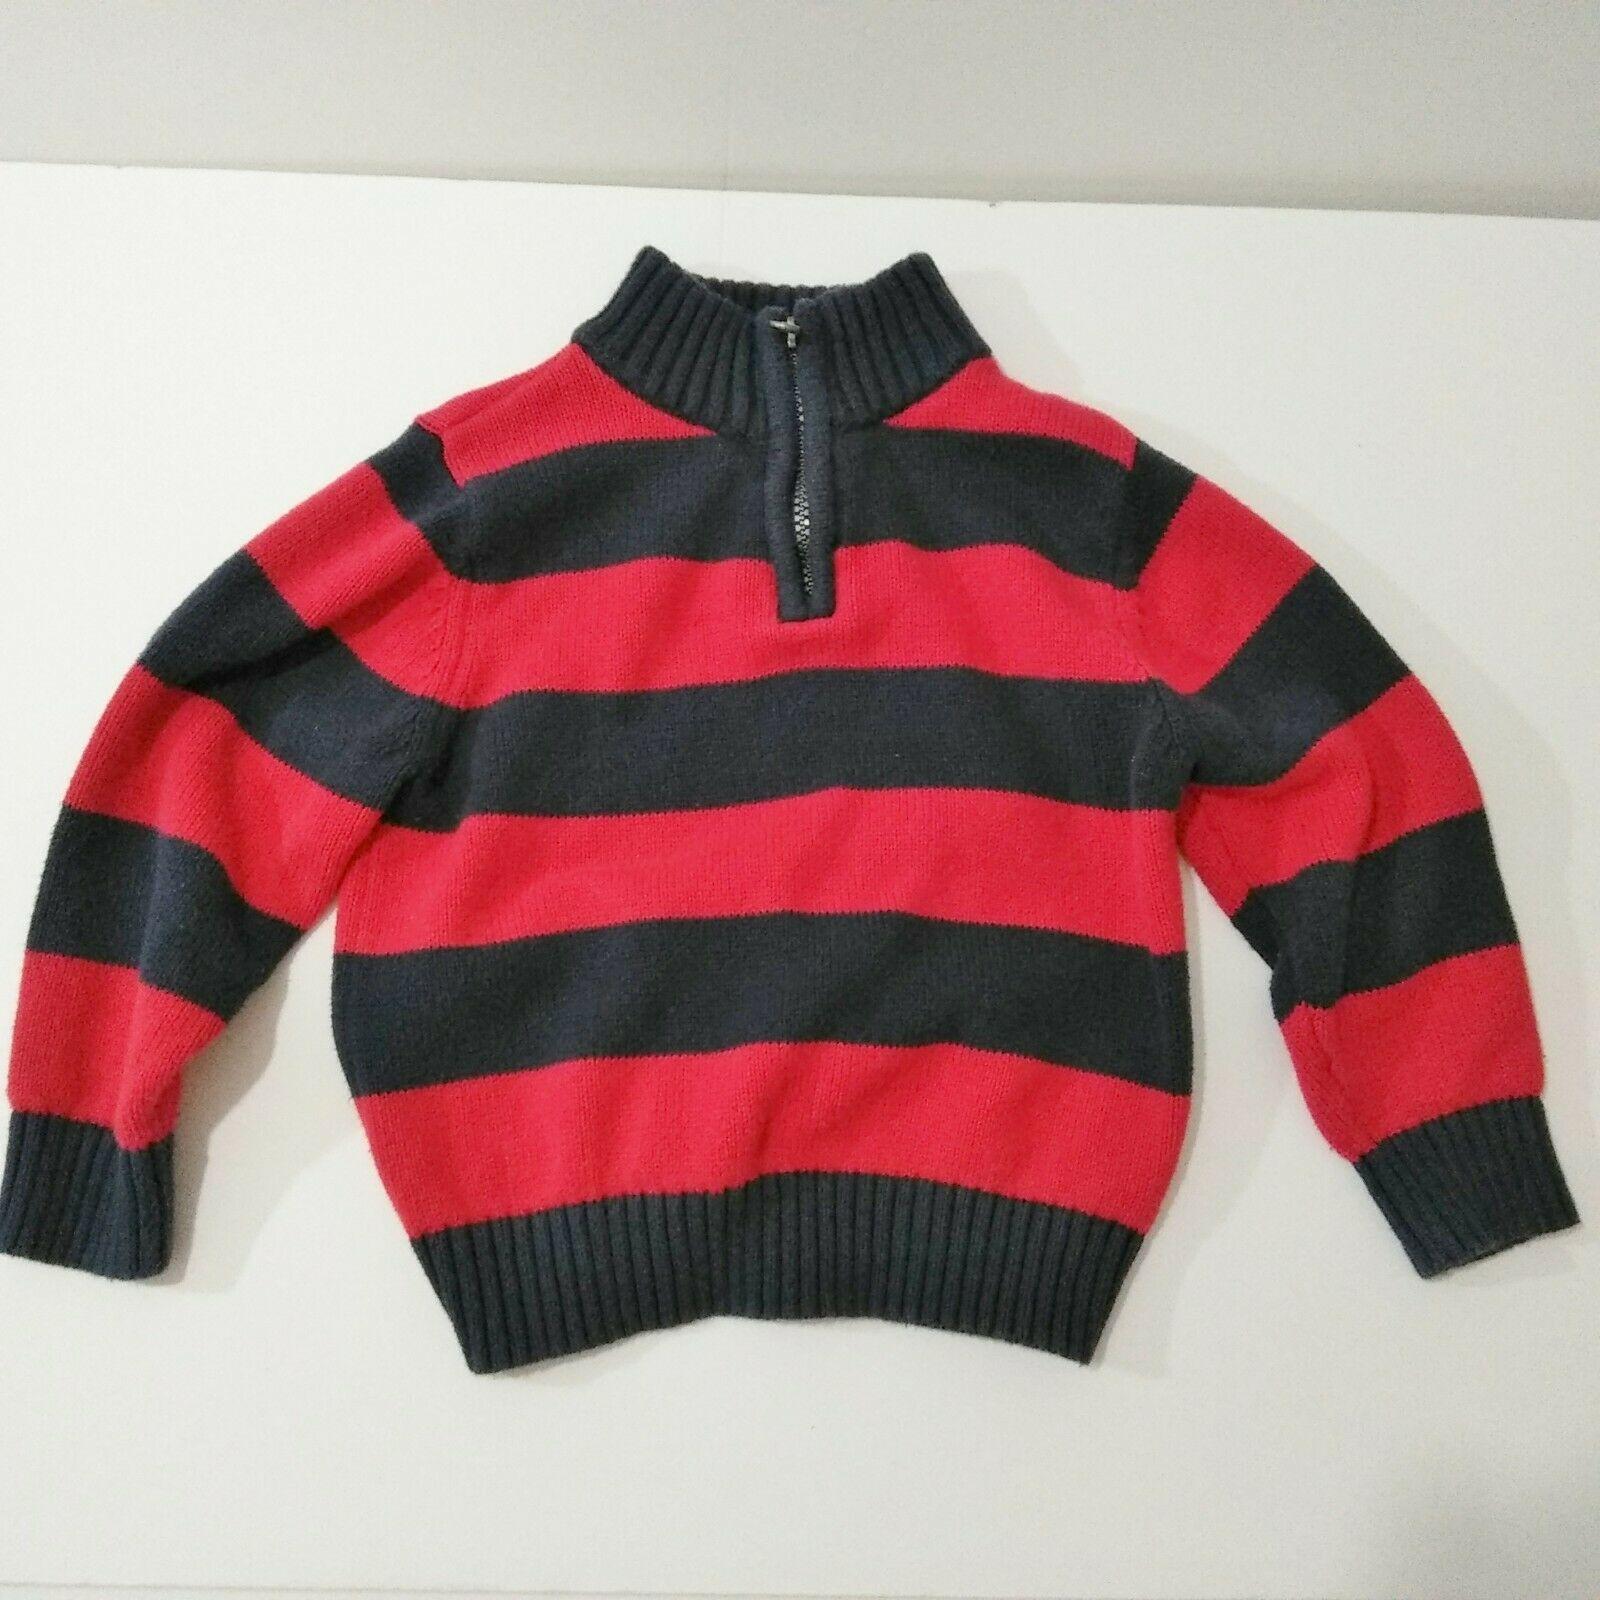 Oshkosh B'gosh 3T Pullover 1/4 Zip Sweater  Red And Blue Stripes Boys  - $9.41